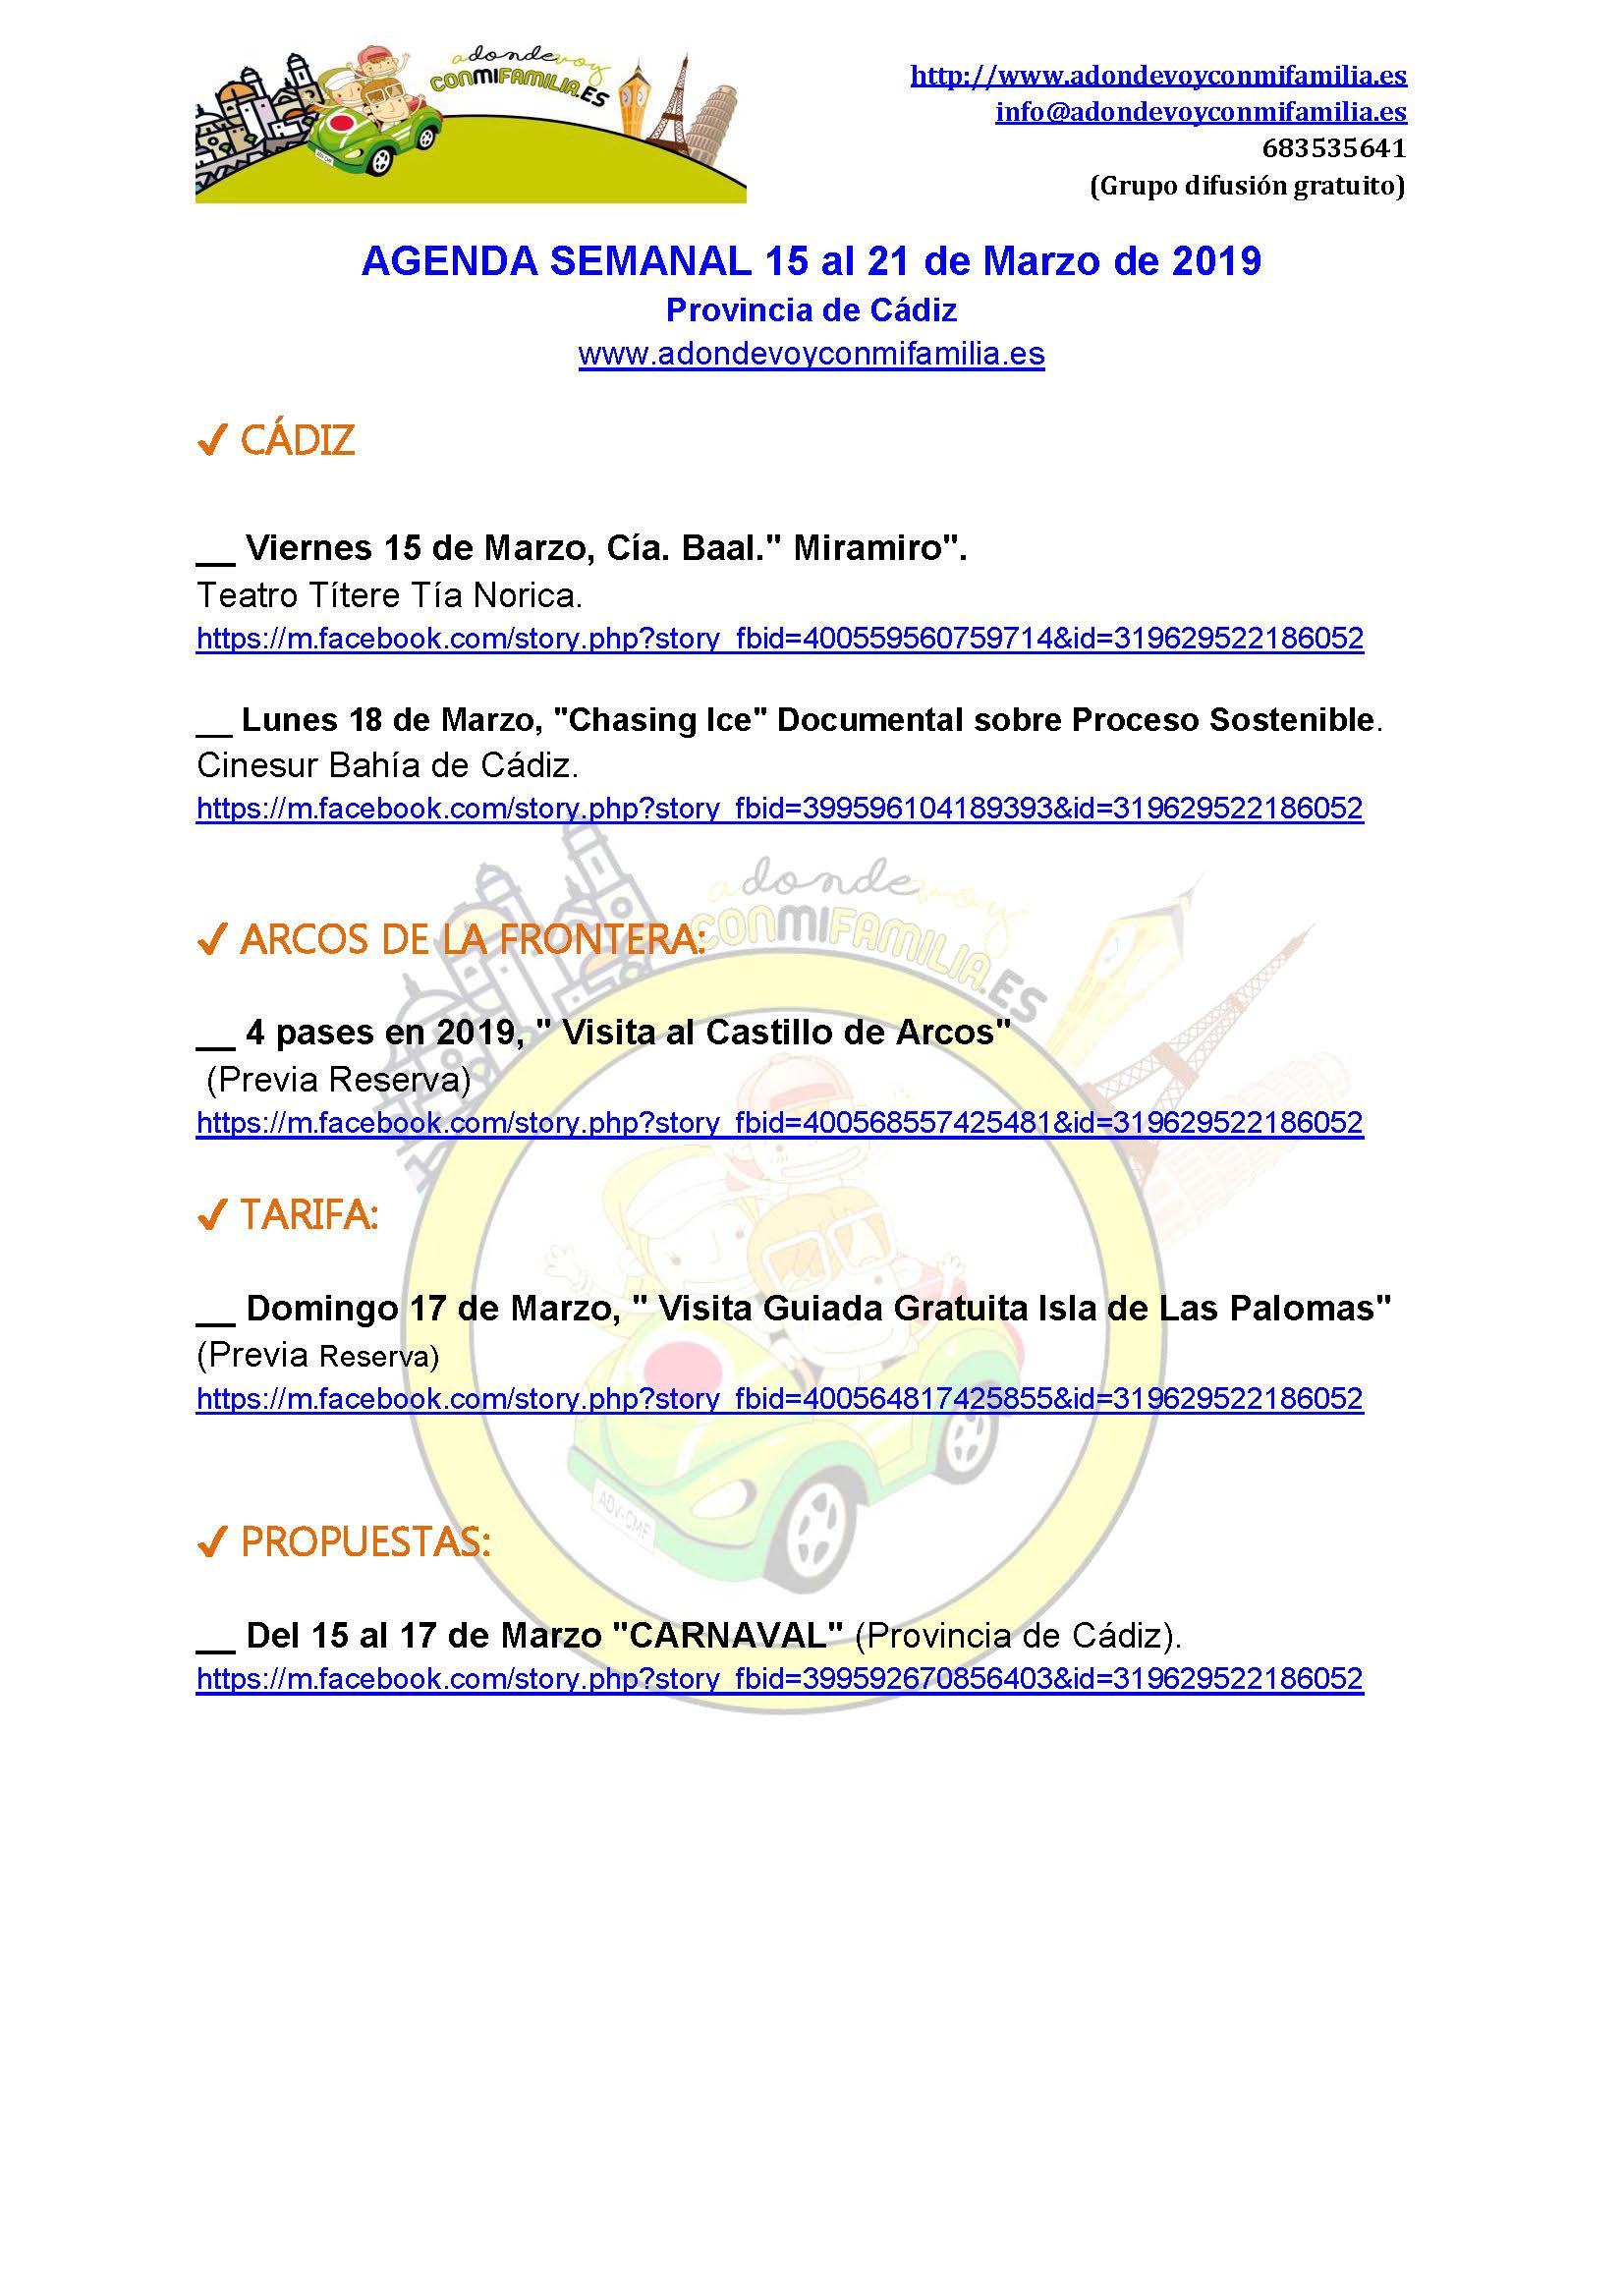 Agenda semanal 15 al 2 4 marzo 2019 provincia cadiz adondevoyconmifamilia